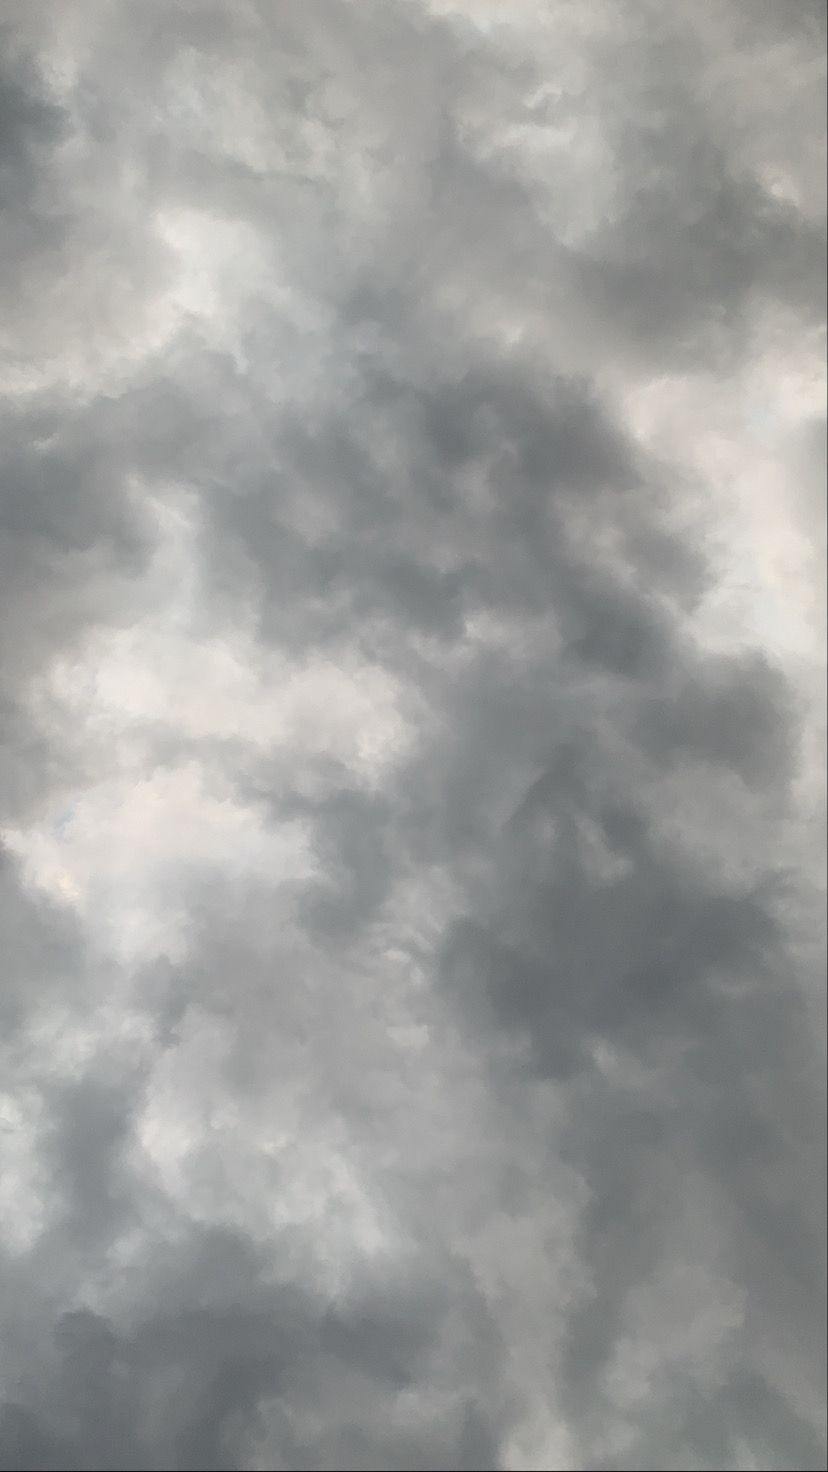 Pin On Soj Fall 20 Kimono Color Combos Grey aesthetic white clouds wallpaper